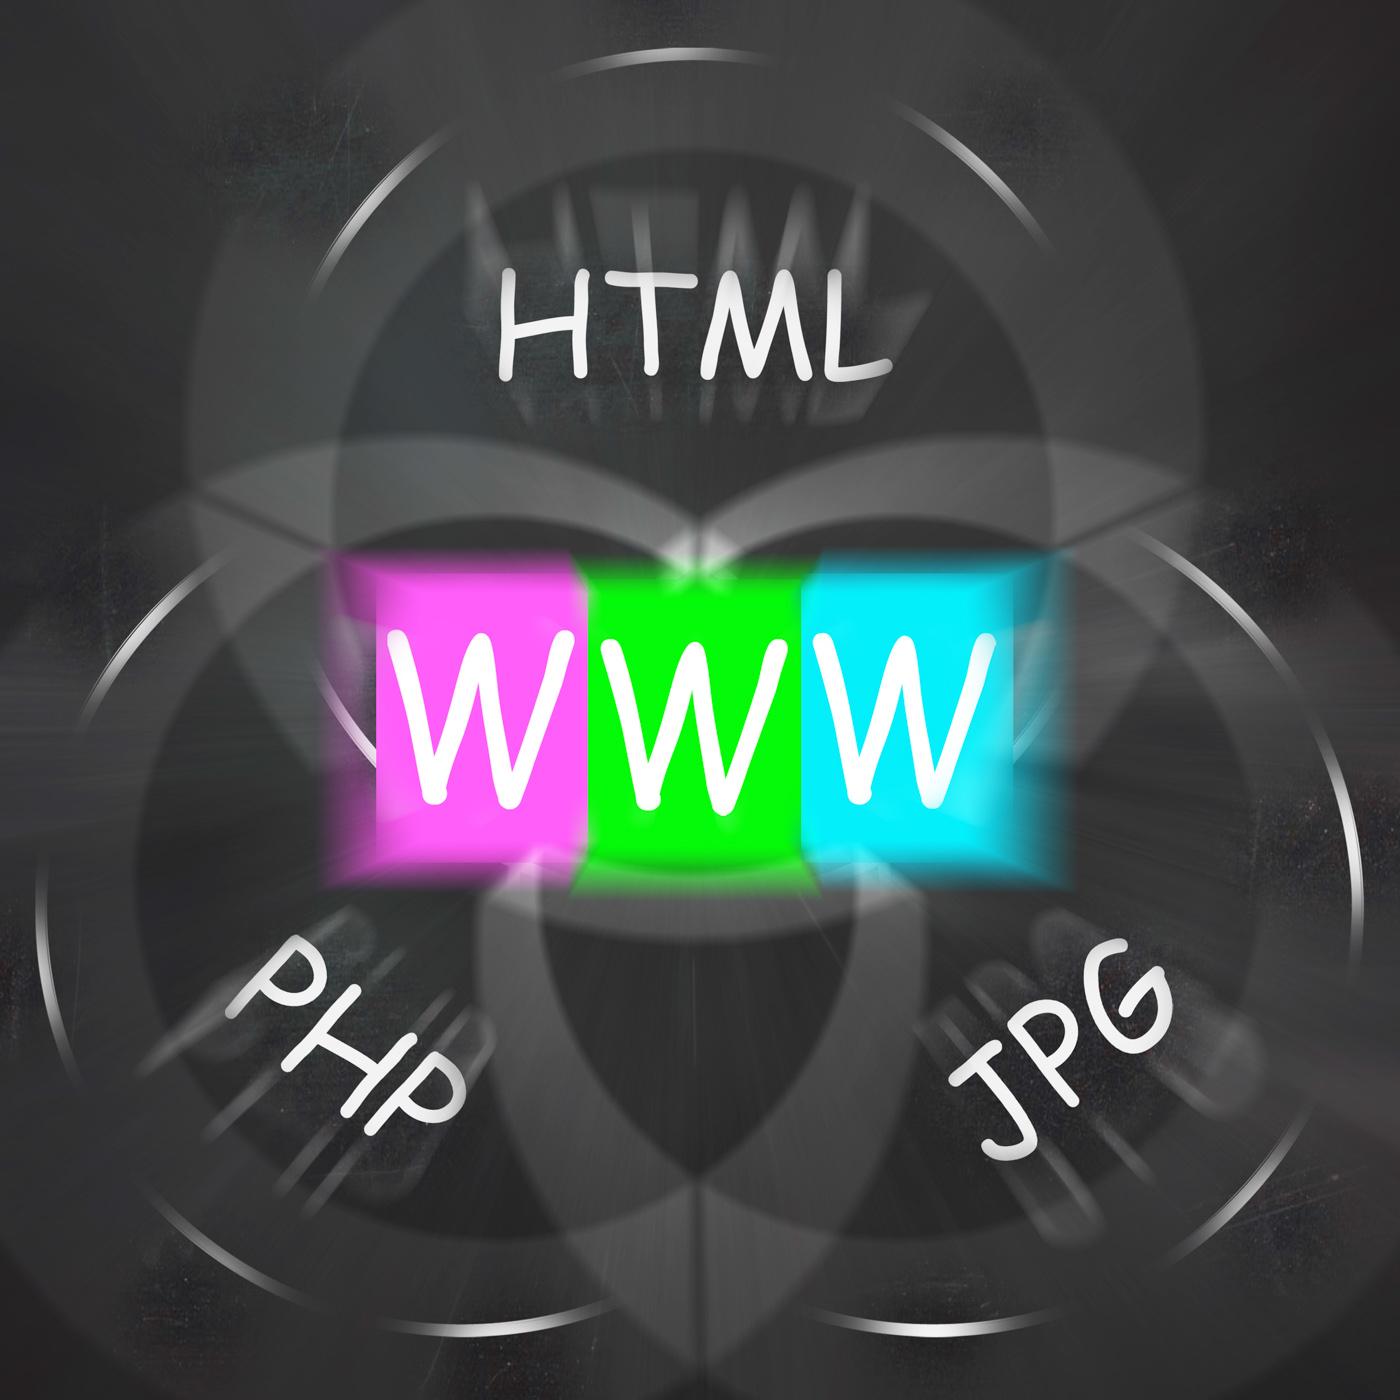 Www on blackboard displays uploading and downloading files photo